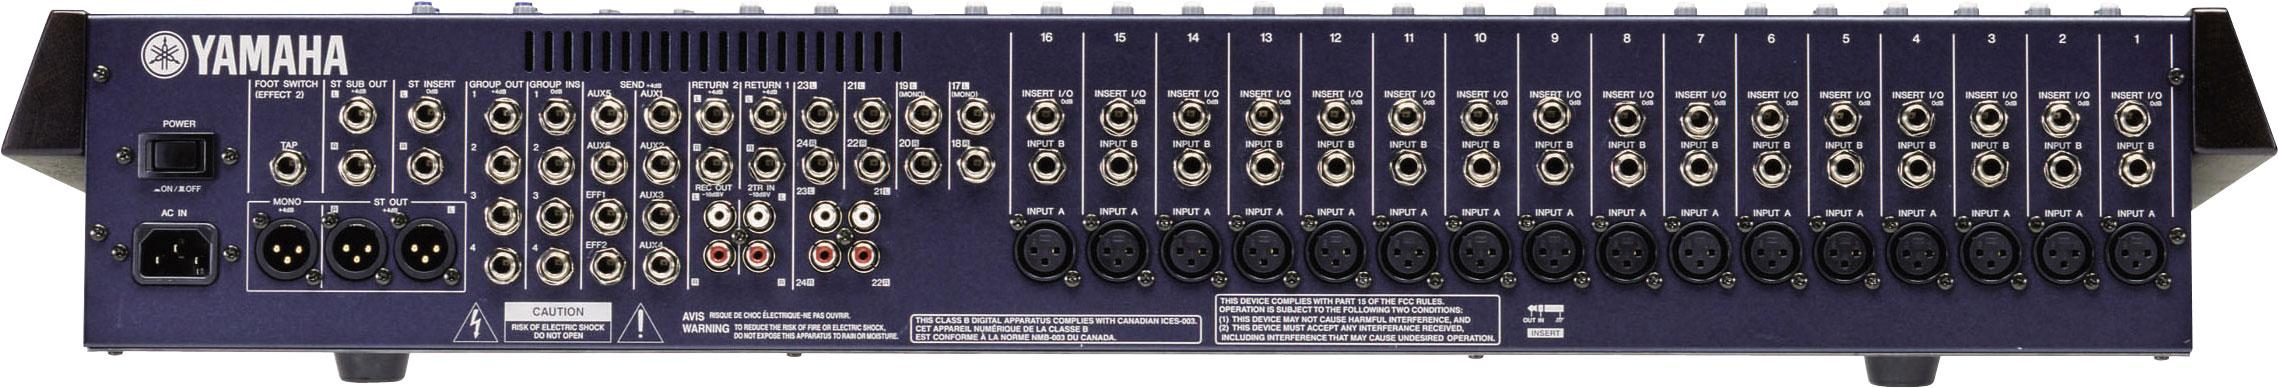 Jual] yamaha mg24/14fx 24 channel input audio mixer.